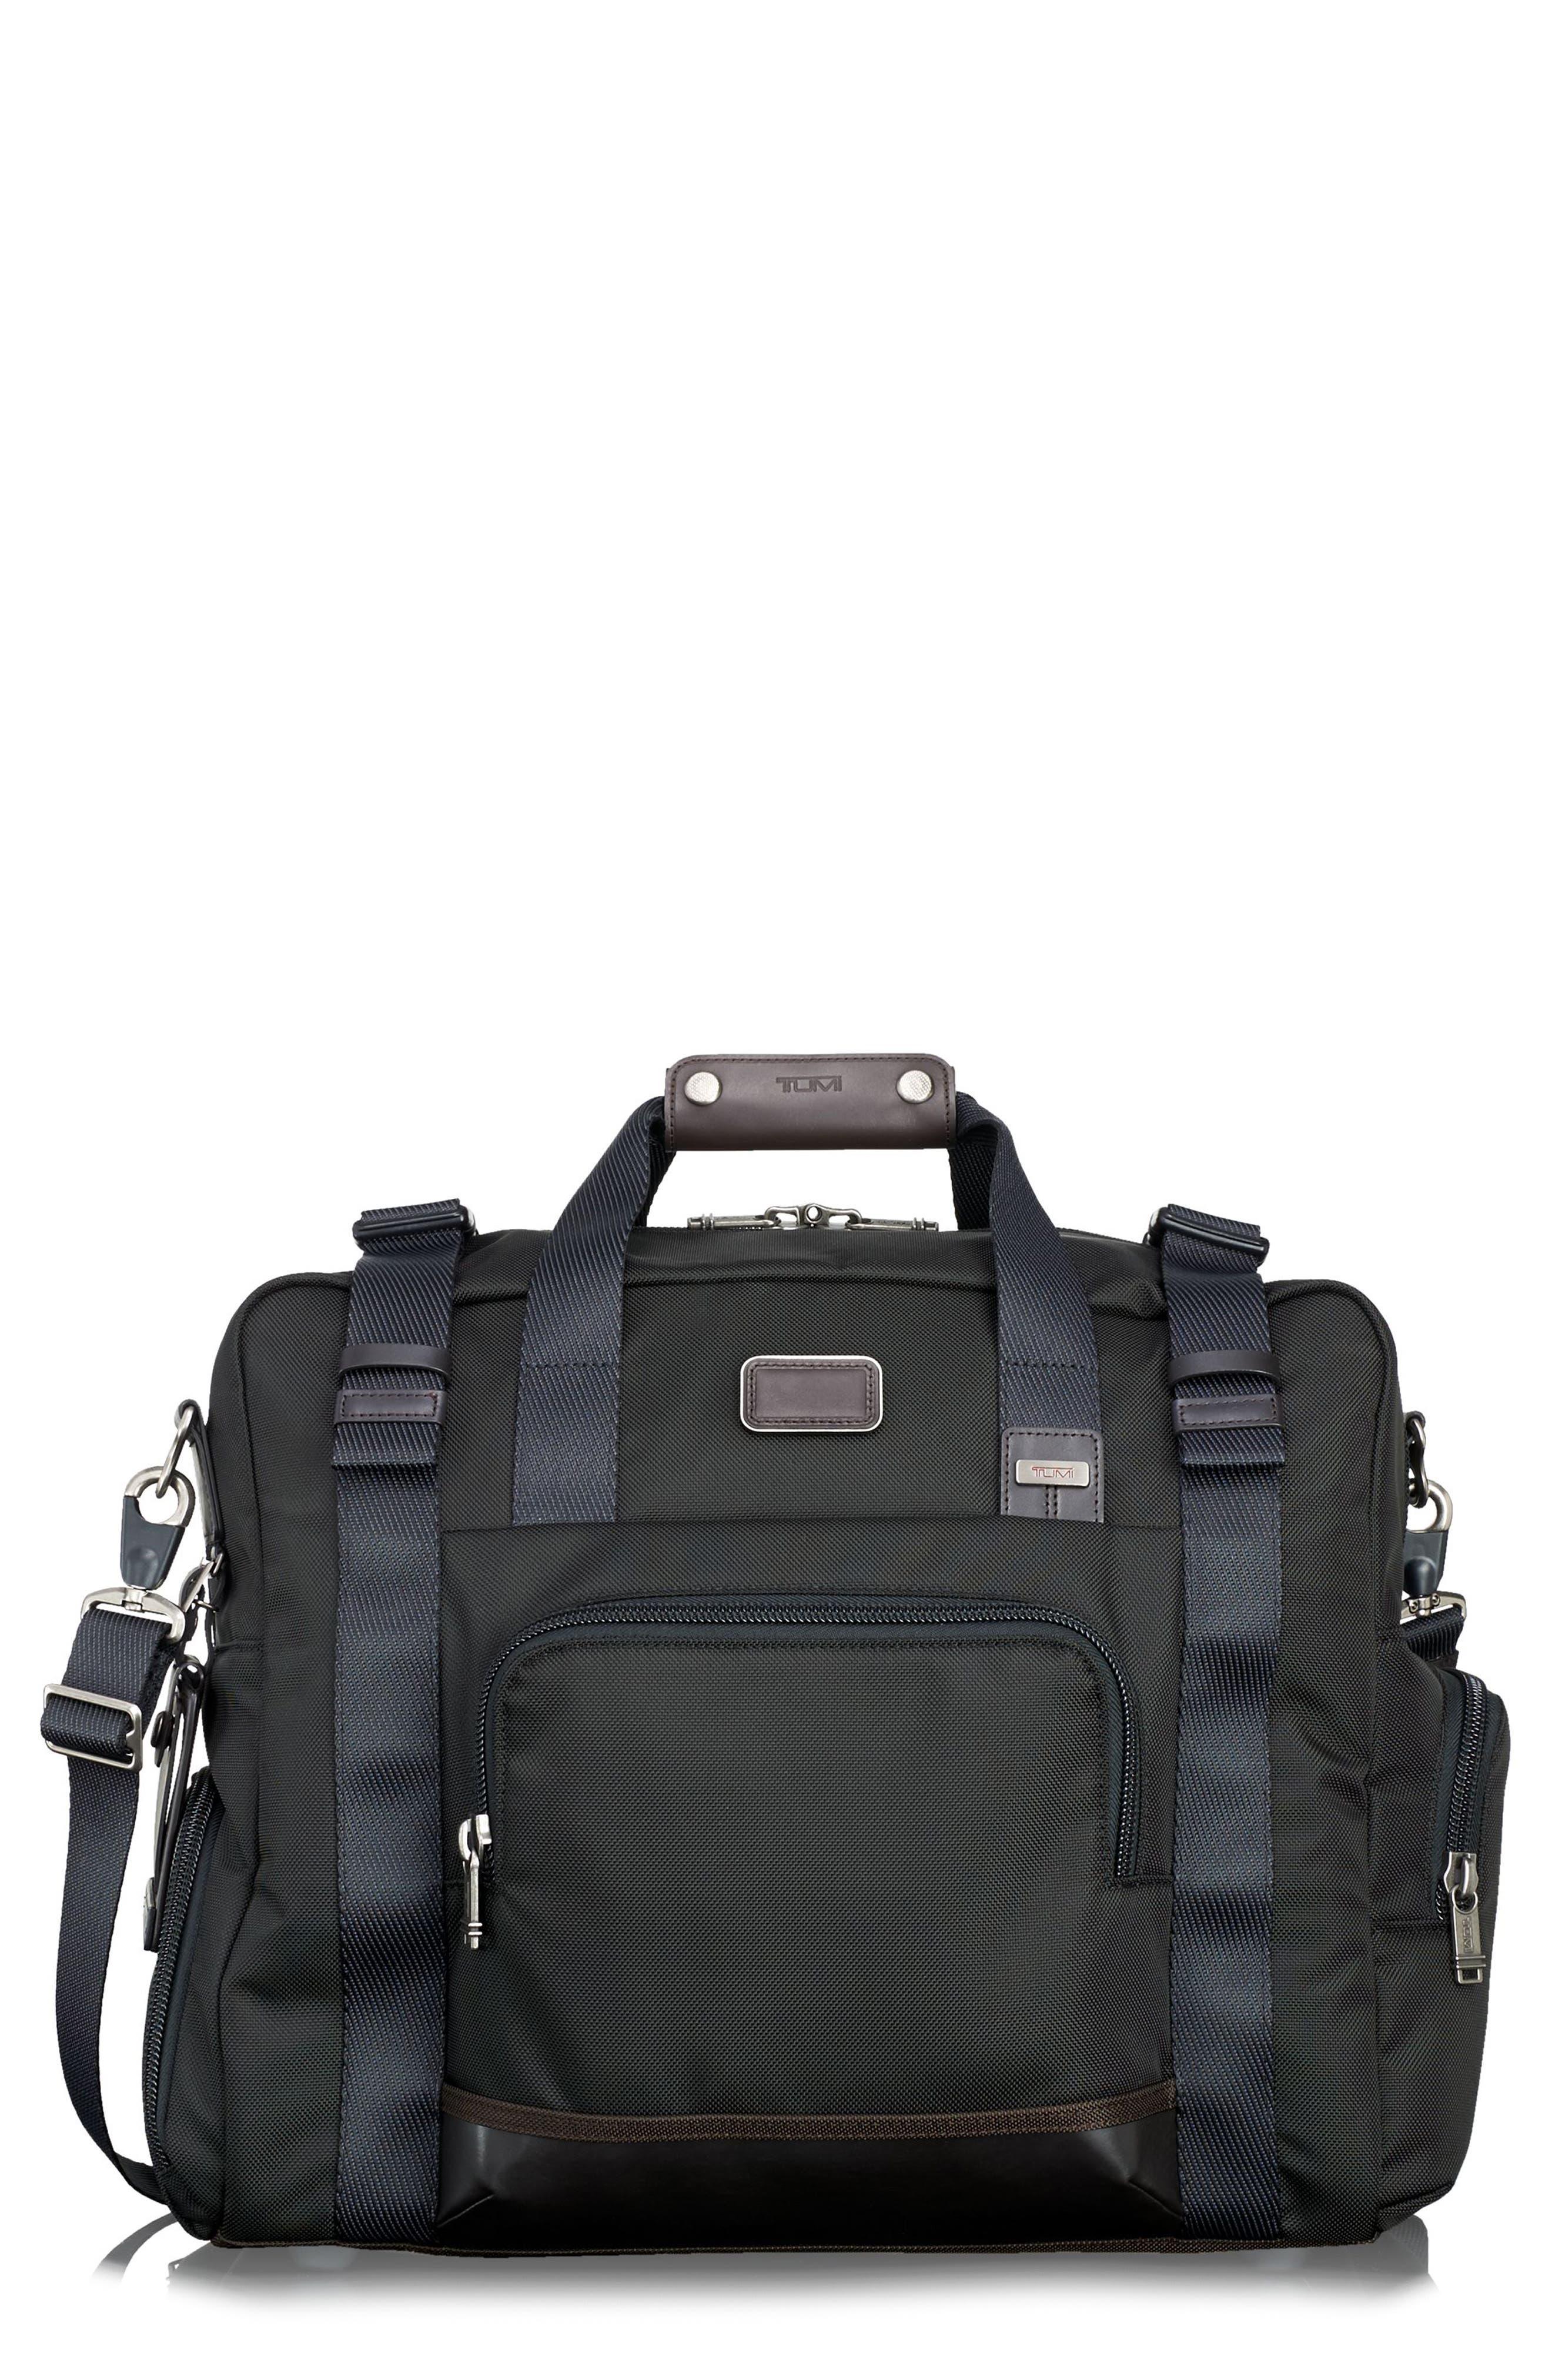 Alpha Bravo Buckner Duffel Bag,                             Main thumbnail 1, color,                             Hickory